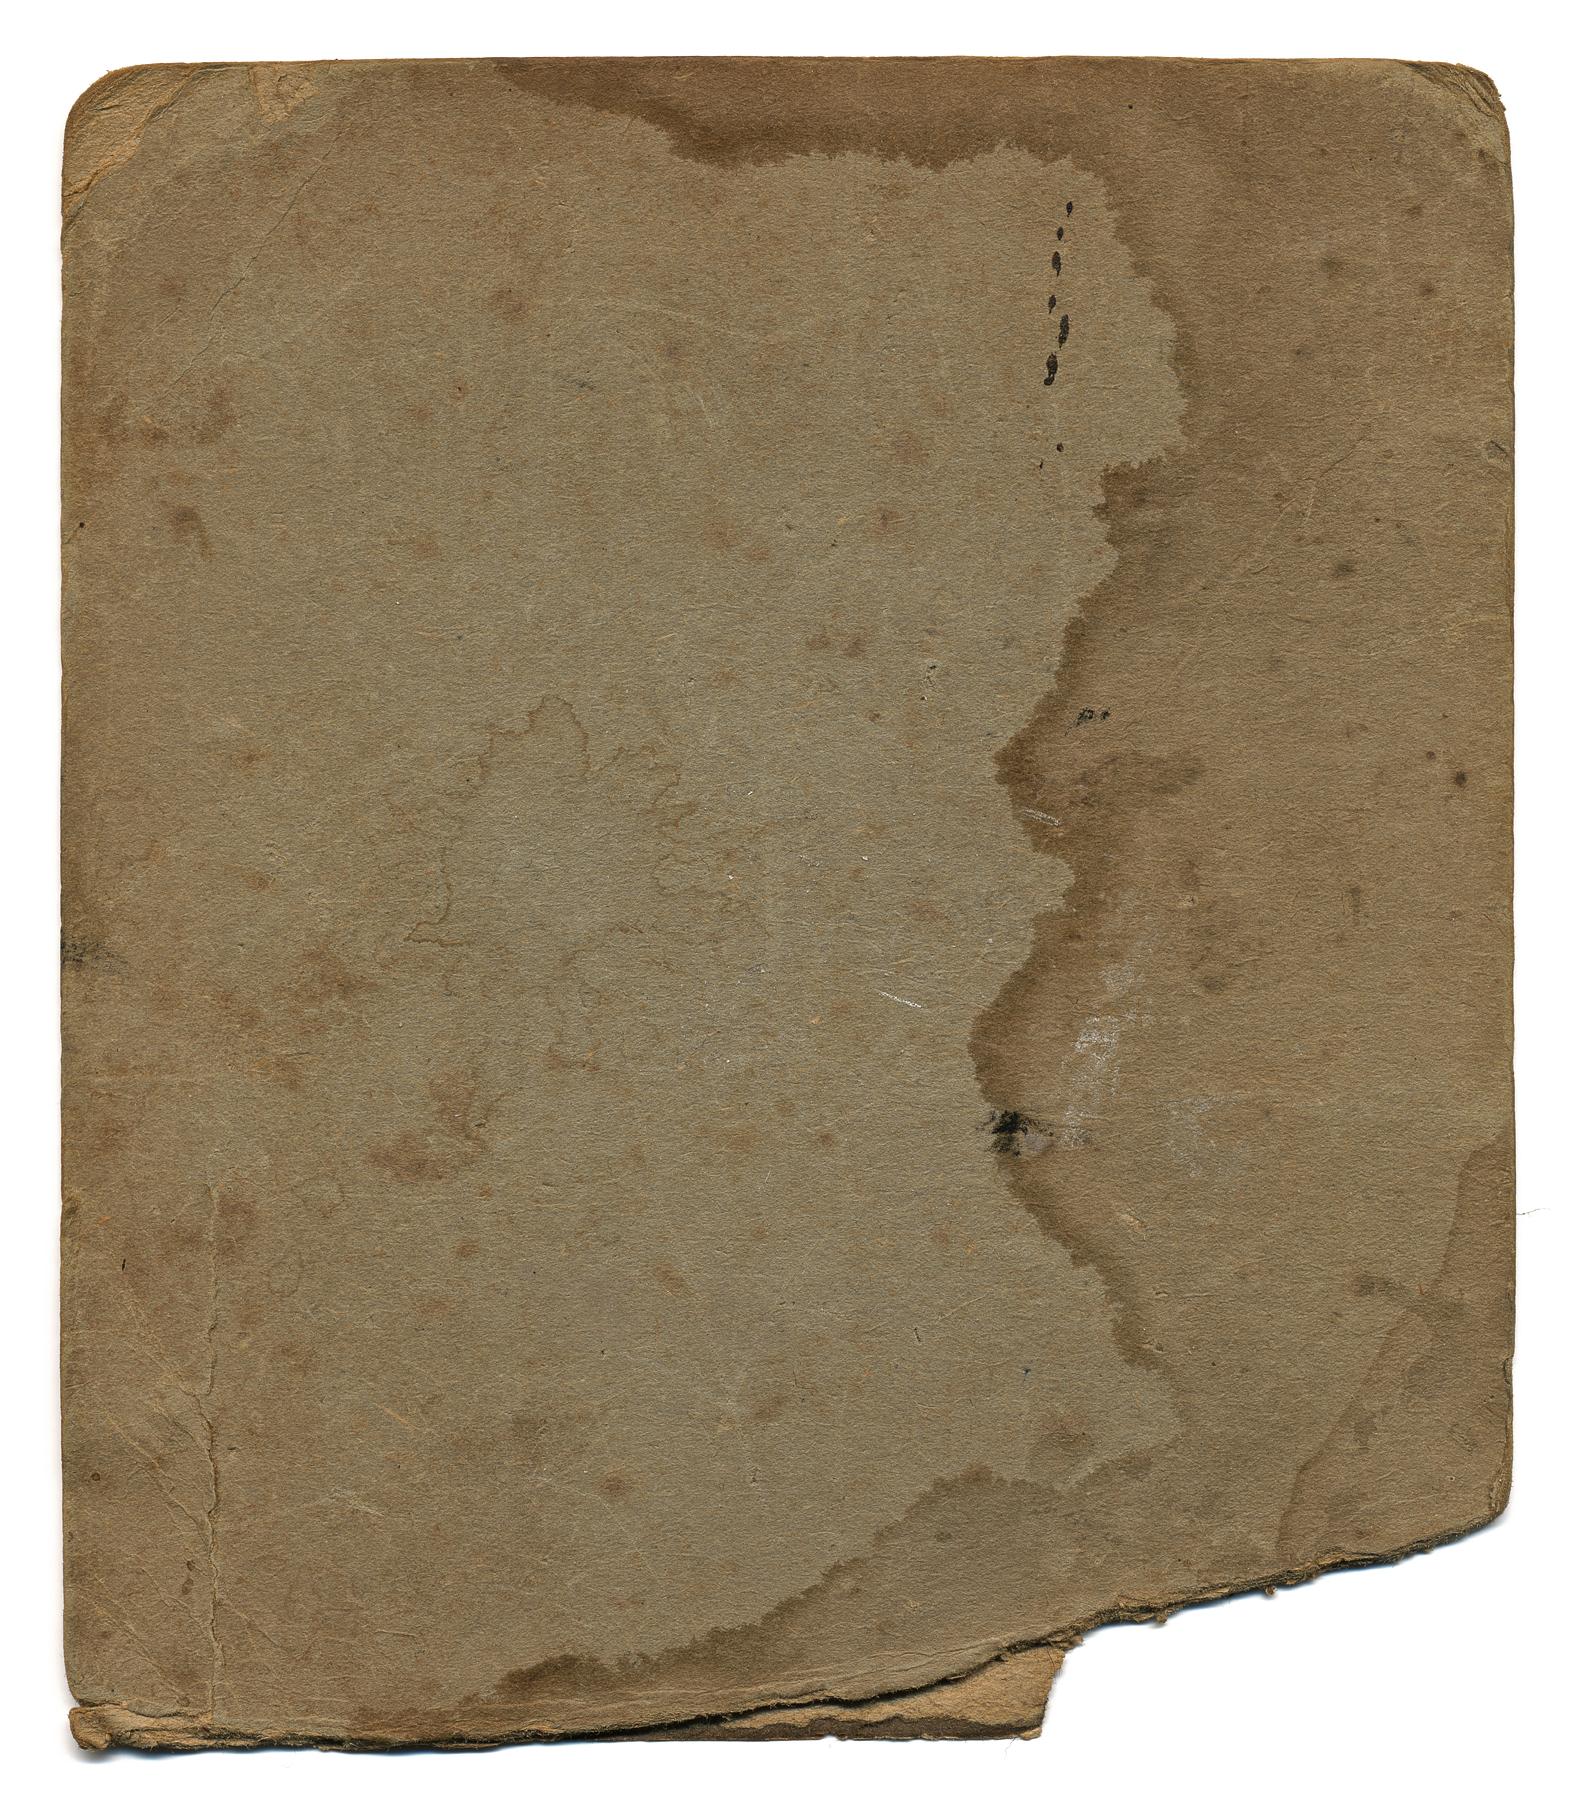 Antique Cardboard, Age, Rustic, Paper, Paperboard, HQ Photo